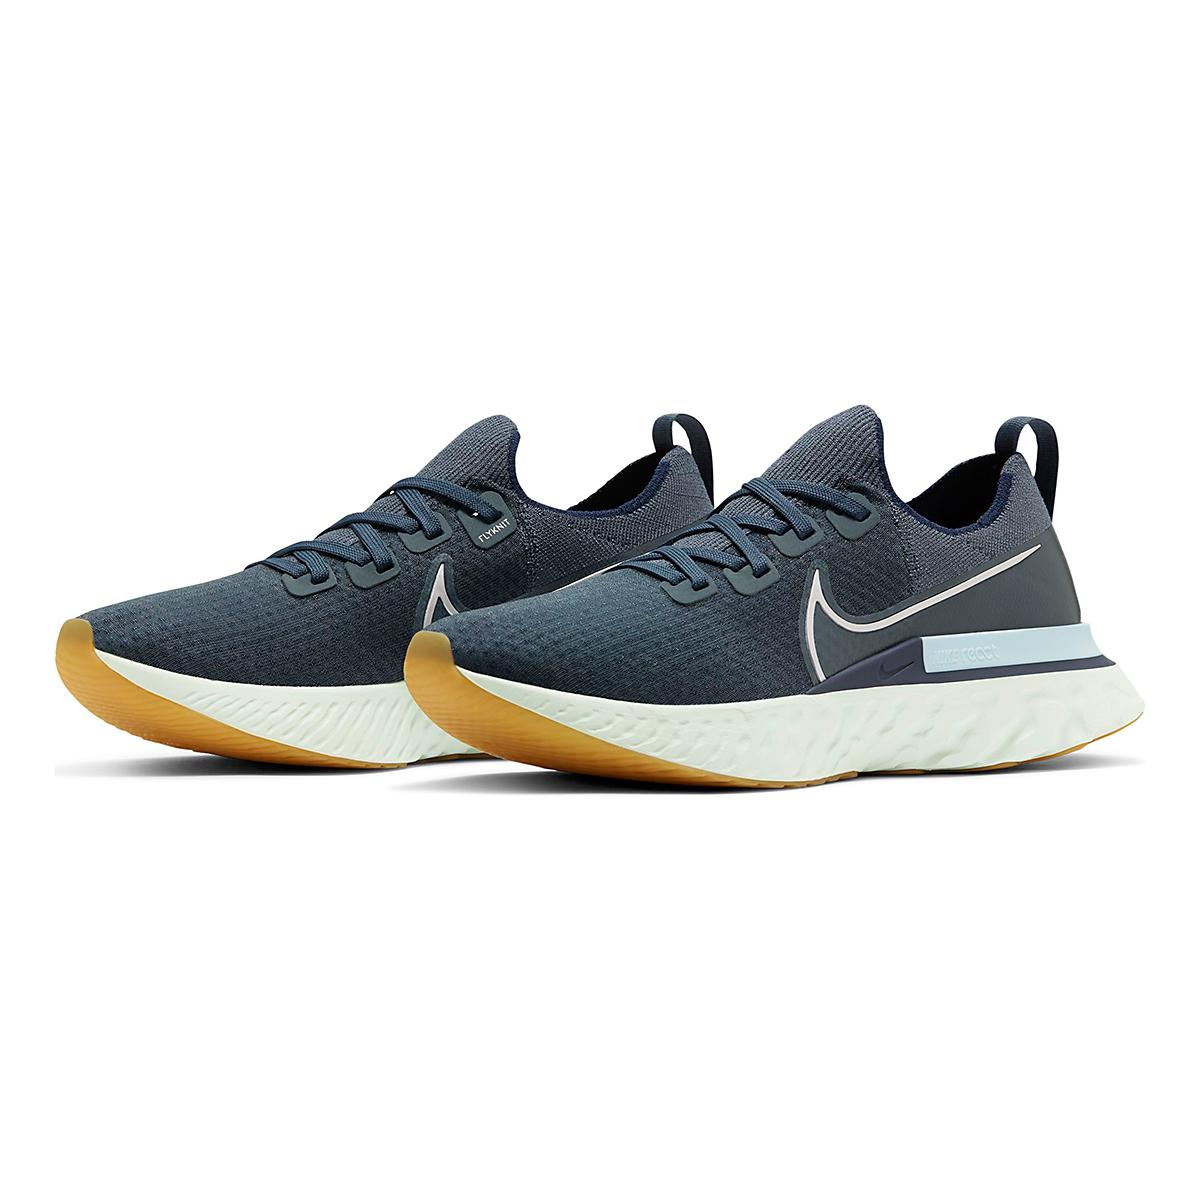 Men's Nike React Infinity Run Flyknit Running Shoe - Color: Blue Fox/Metallic Silver - Size: 6 - Width: Regular, Blue Fox/Metallic Silver, large, image 3